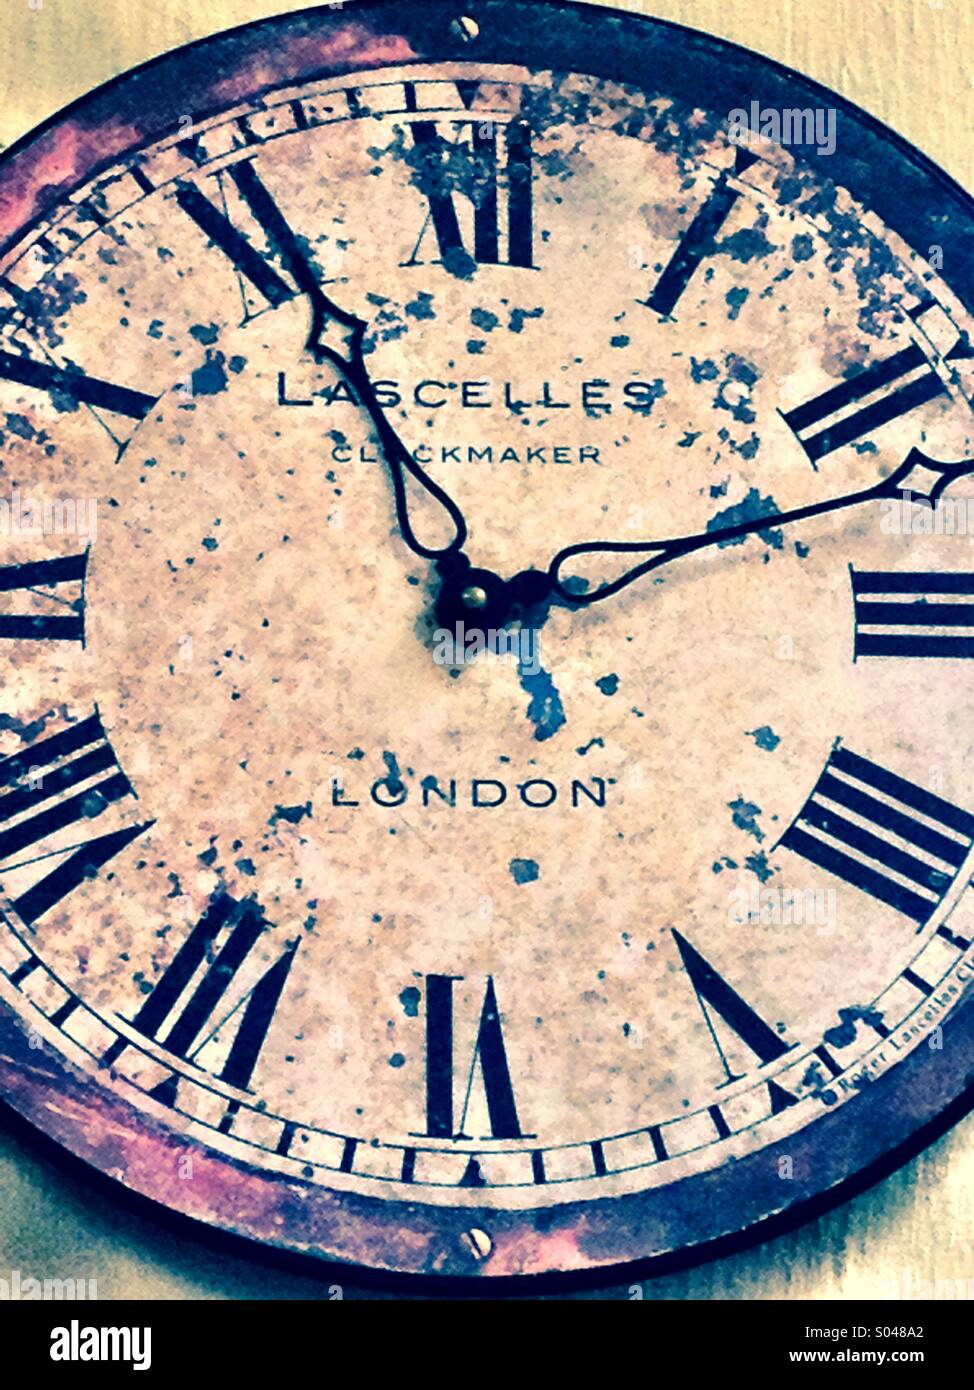 Timeless London - Stock Image